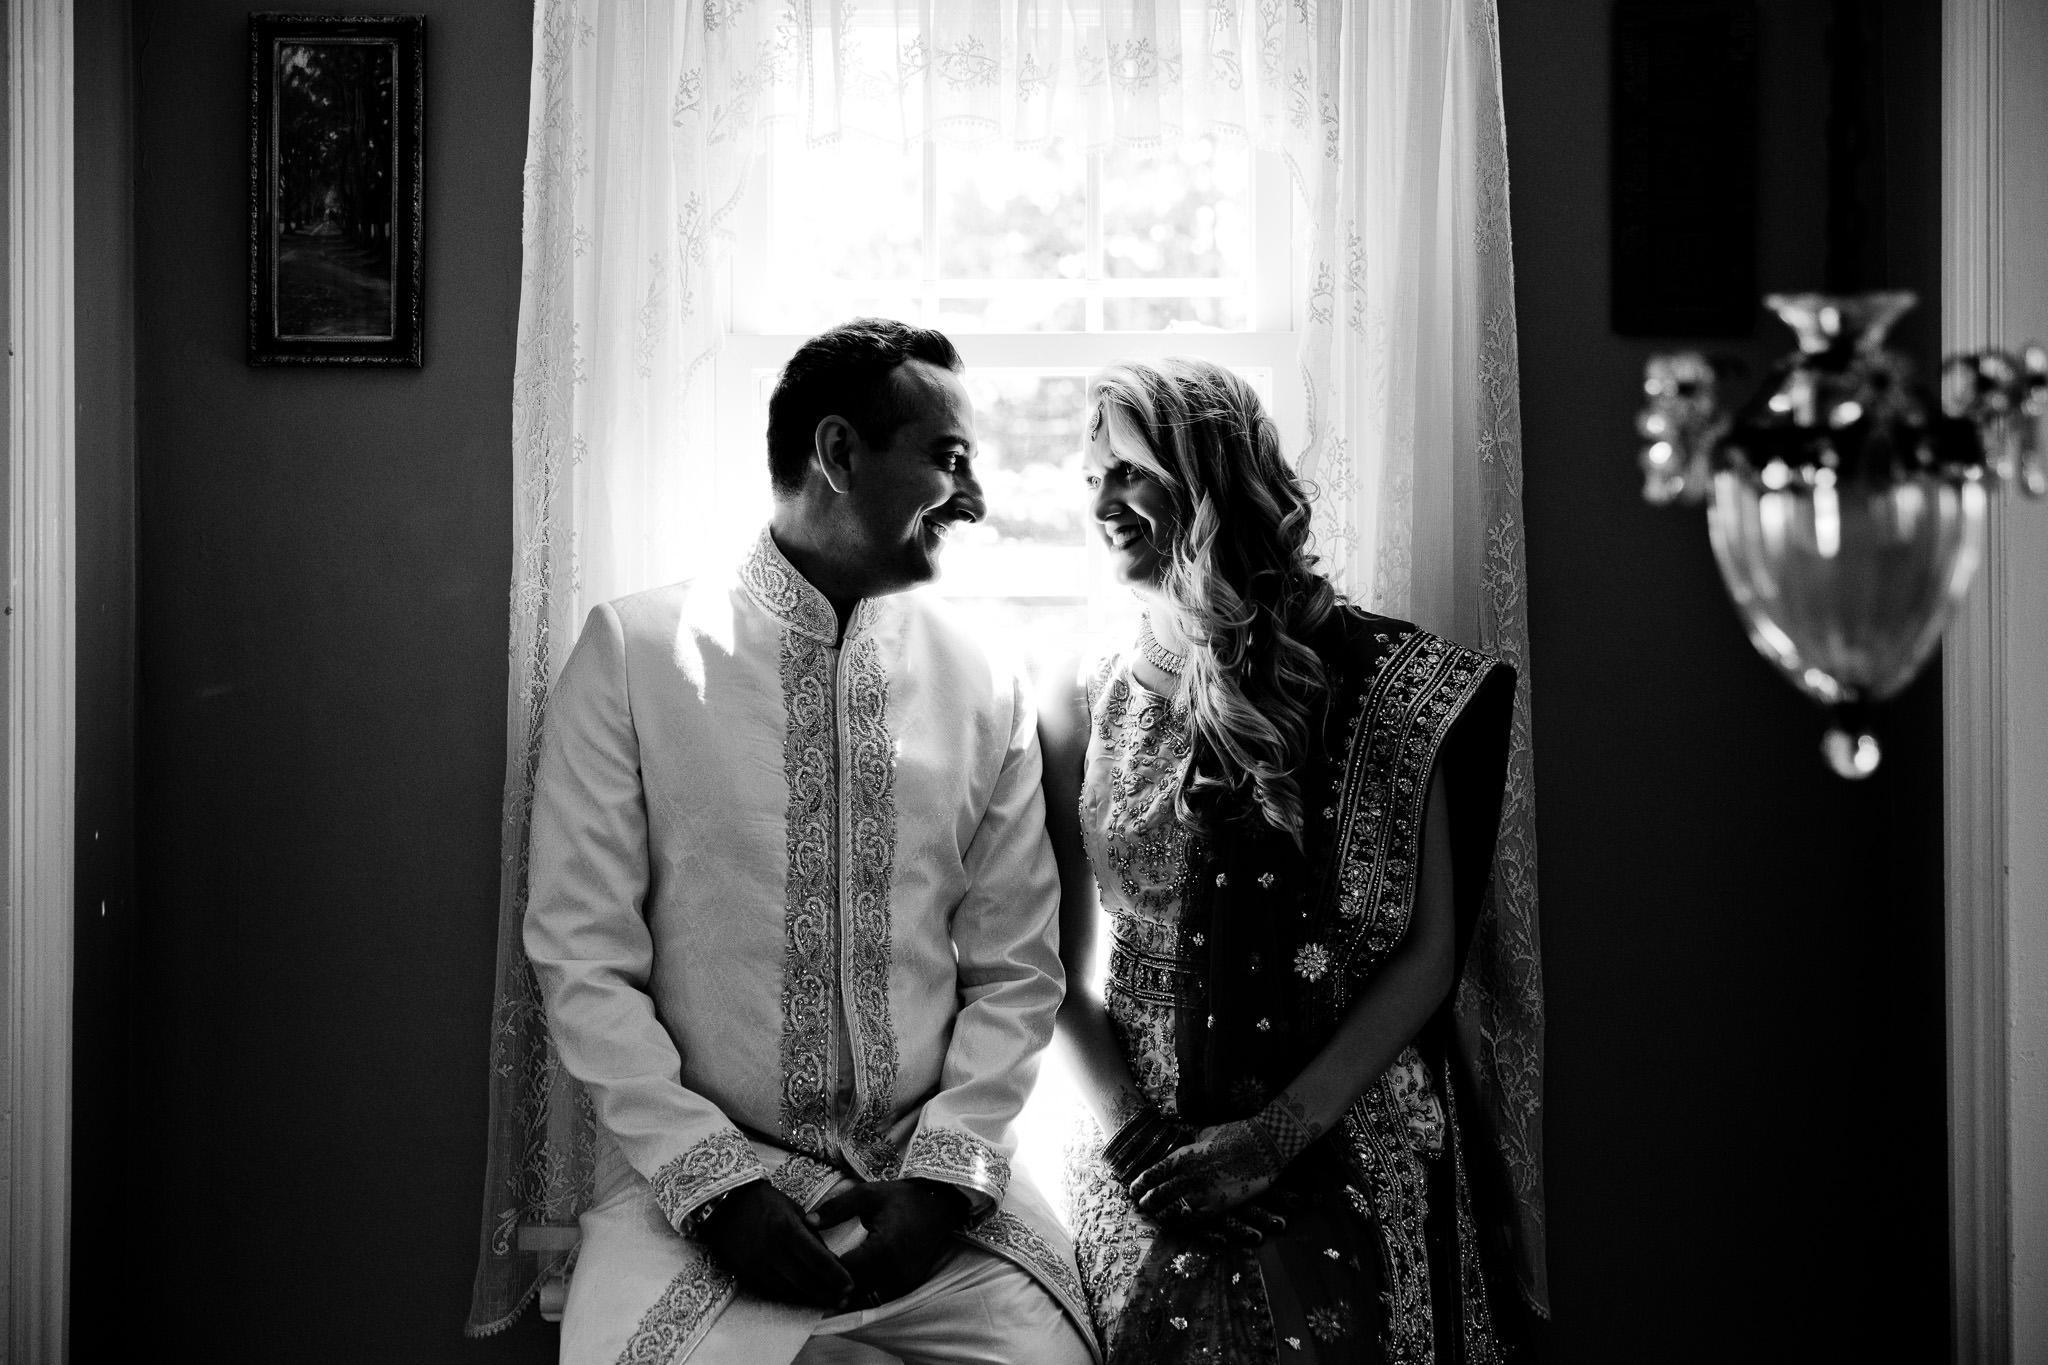 022_Canada-documentary-wedding-photograp